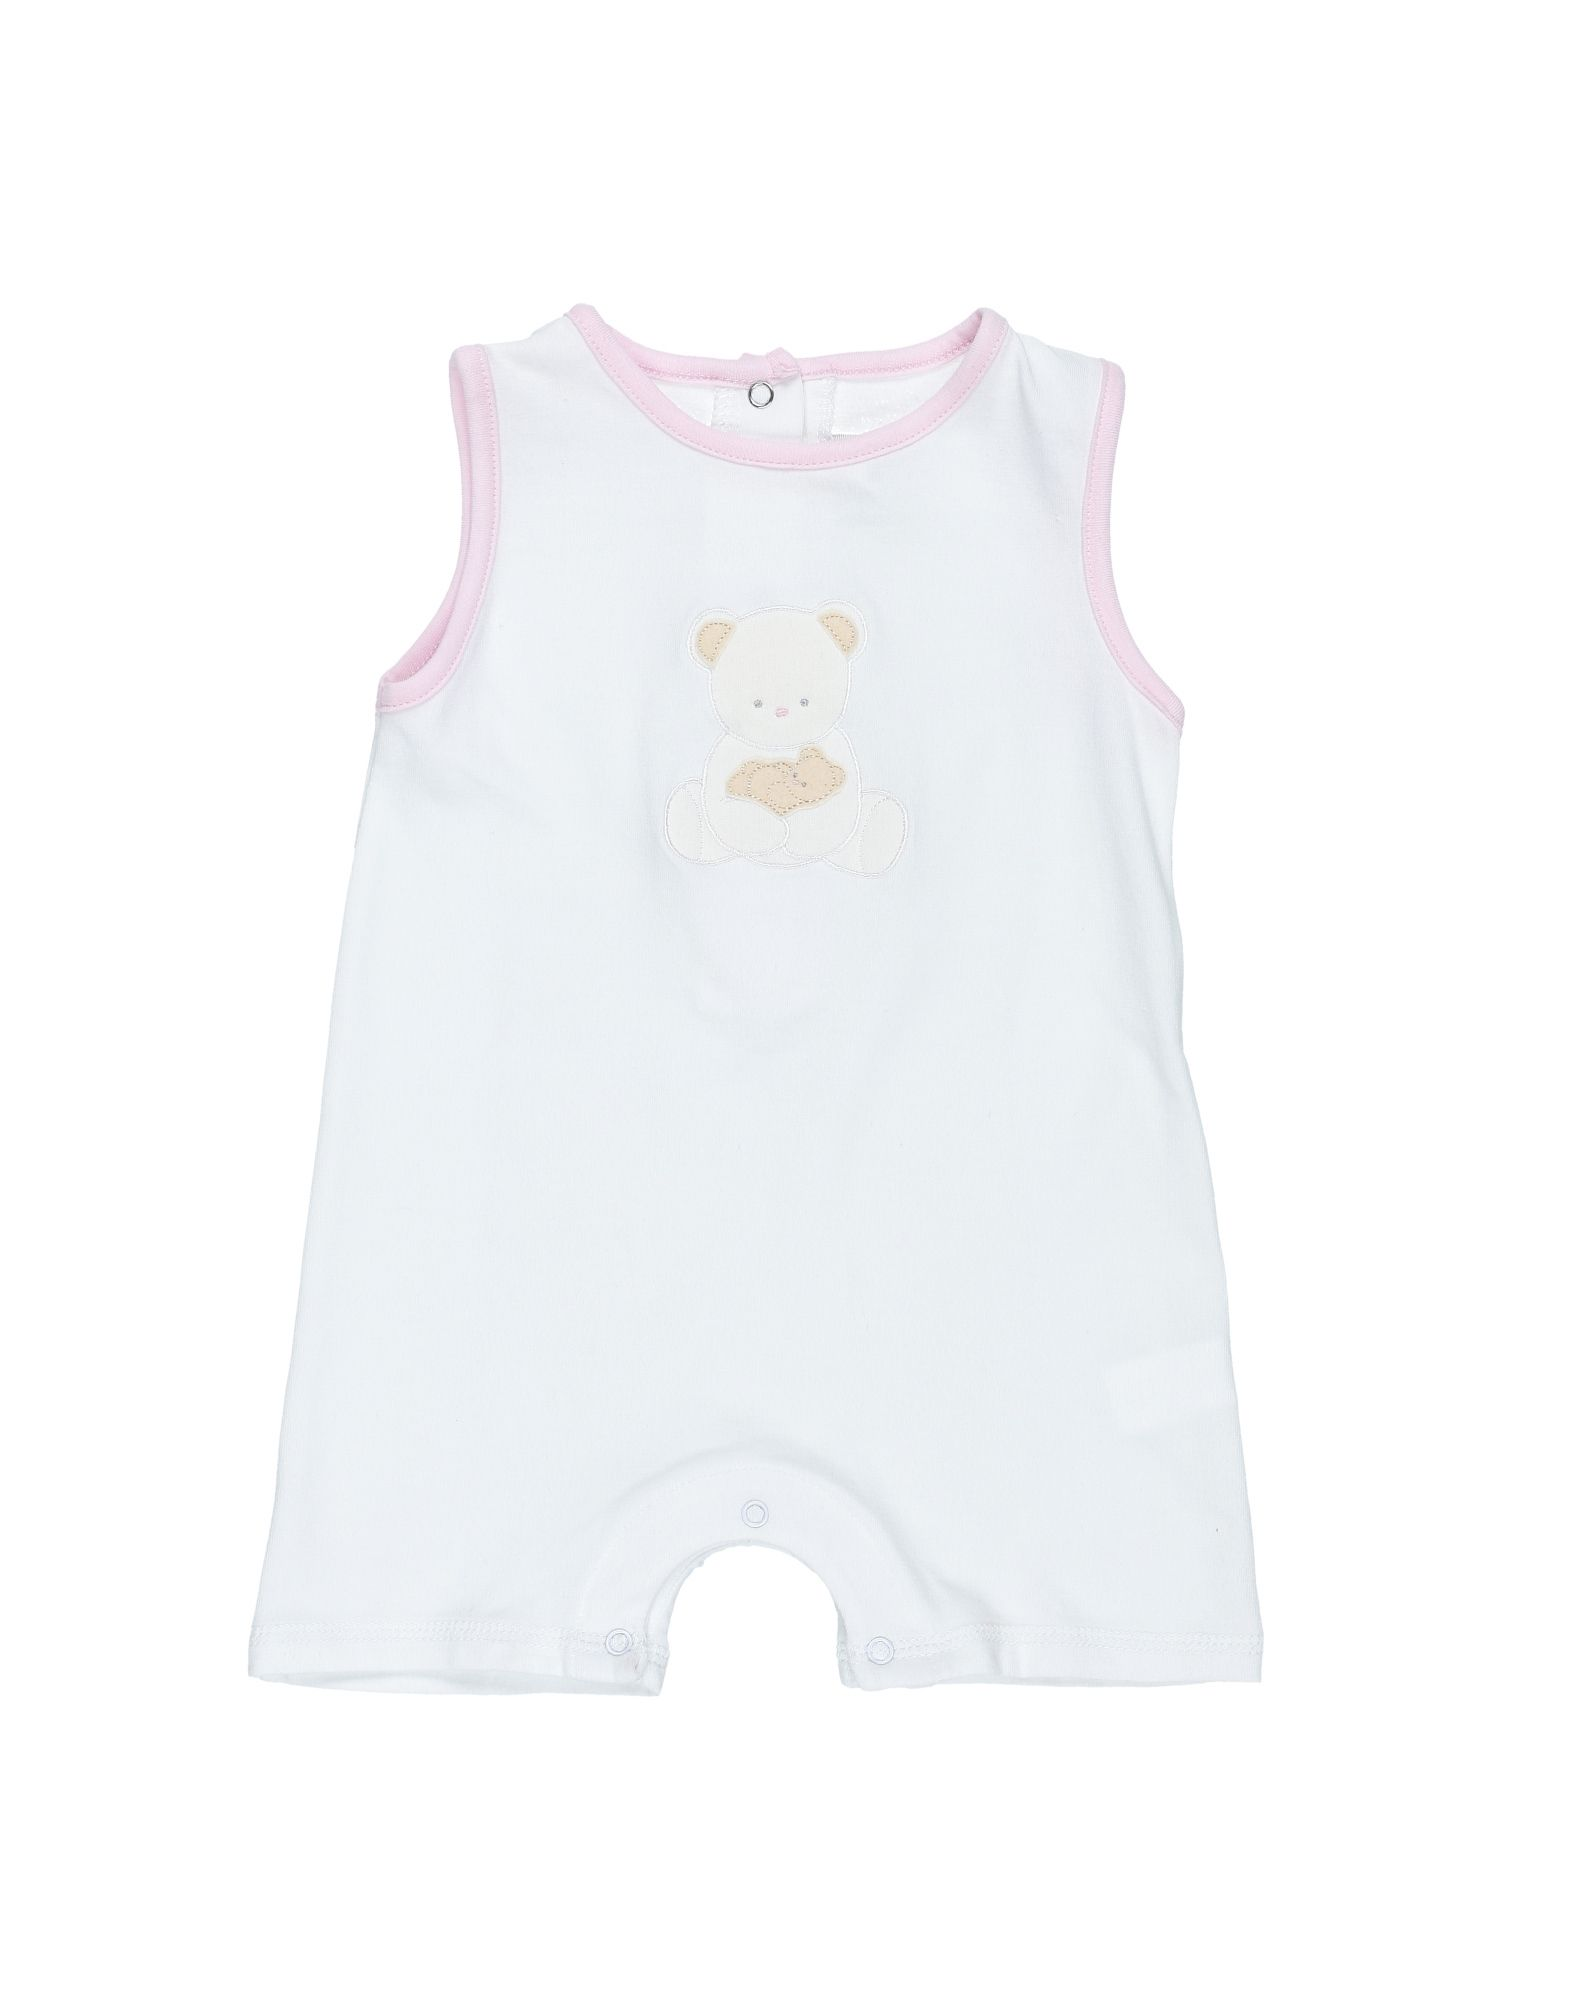 YOOX.COM(ユークス)《セール開催中》COCCOD? ガールズ 0-24 ヶ月 乳幼児用ロンパース ホワイト 9 コットン 95% / ポリウレタン 5%